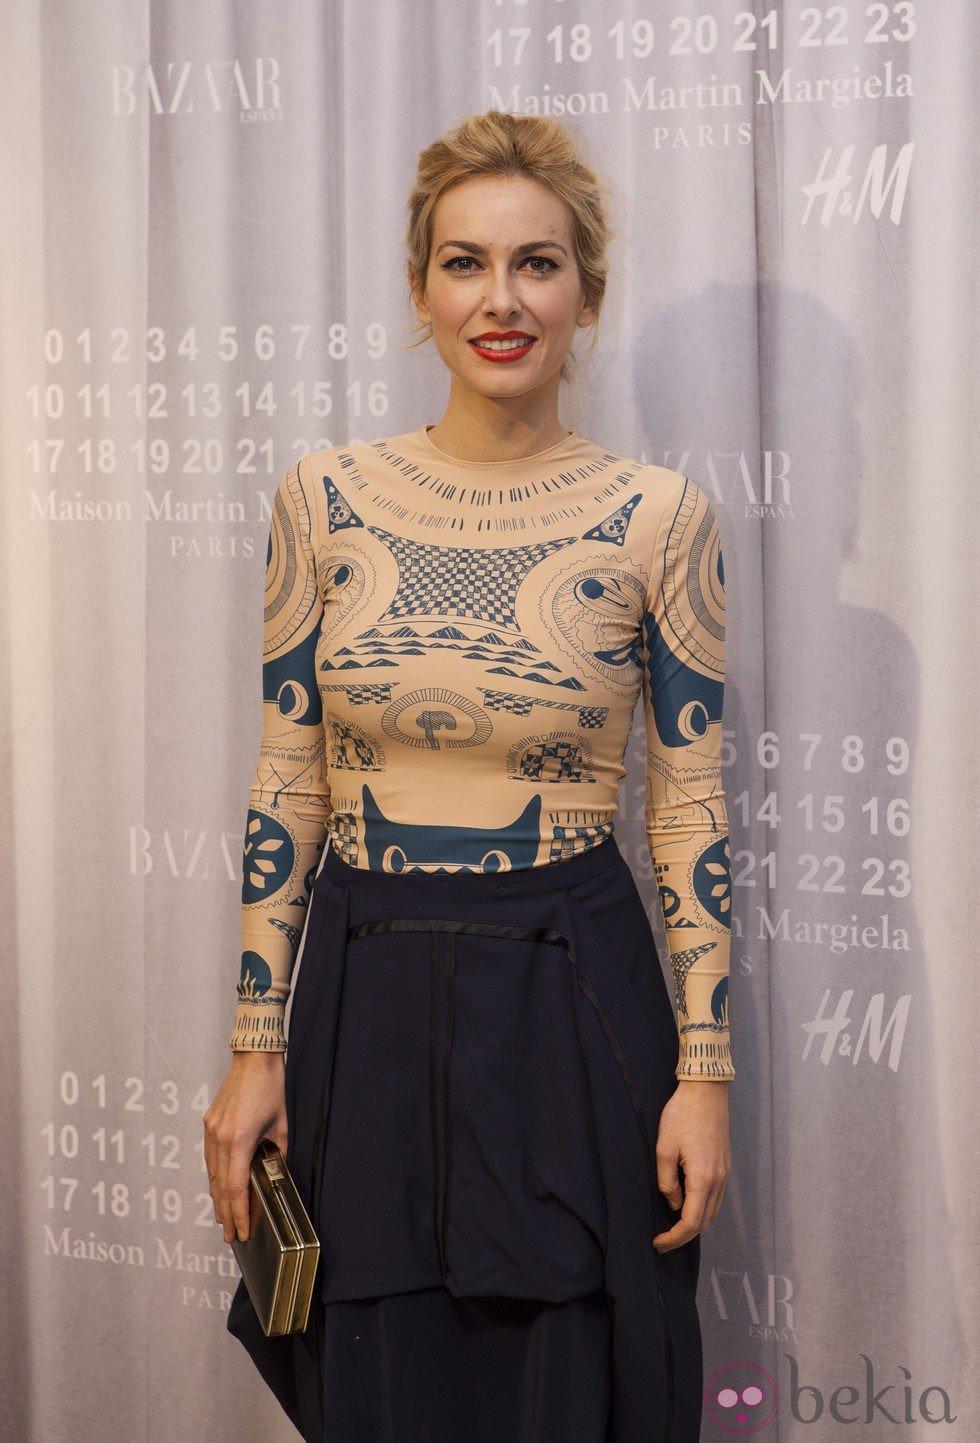 Kira Miró en la fiesta de Maison Martin Margiela y H&M